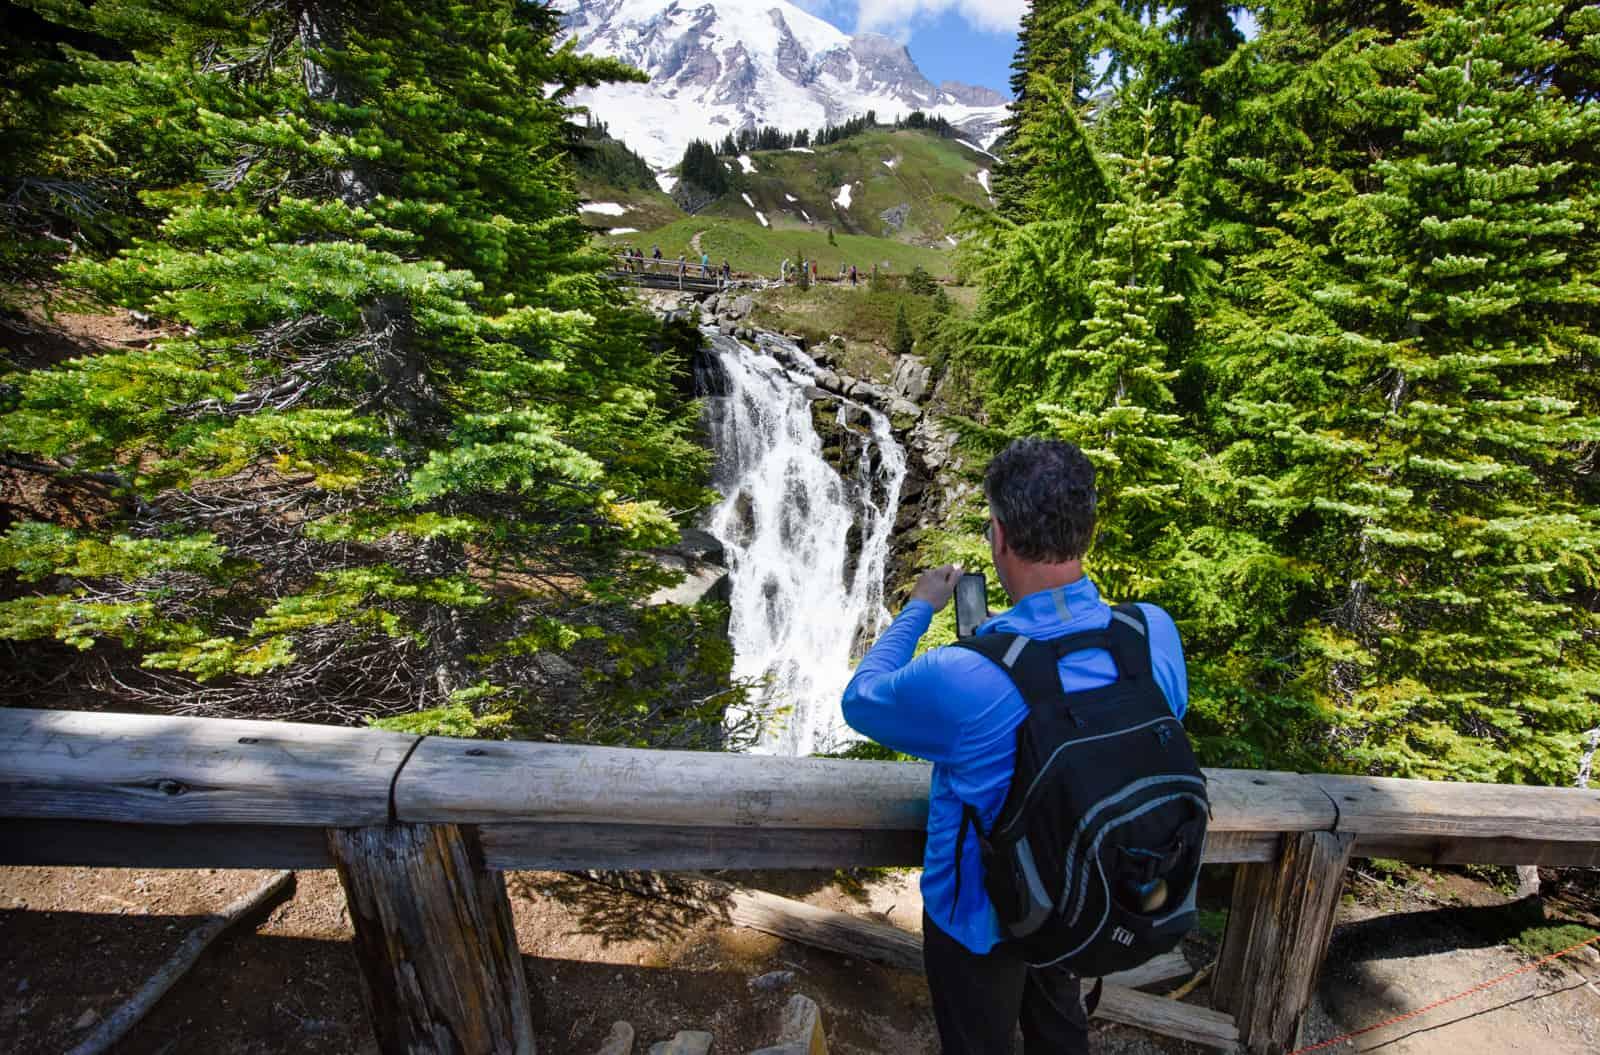 Mt. Rainier - Credit Jim Meyers